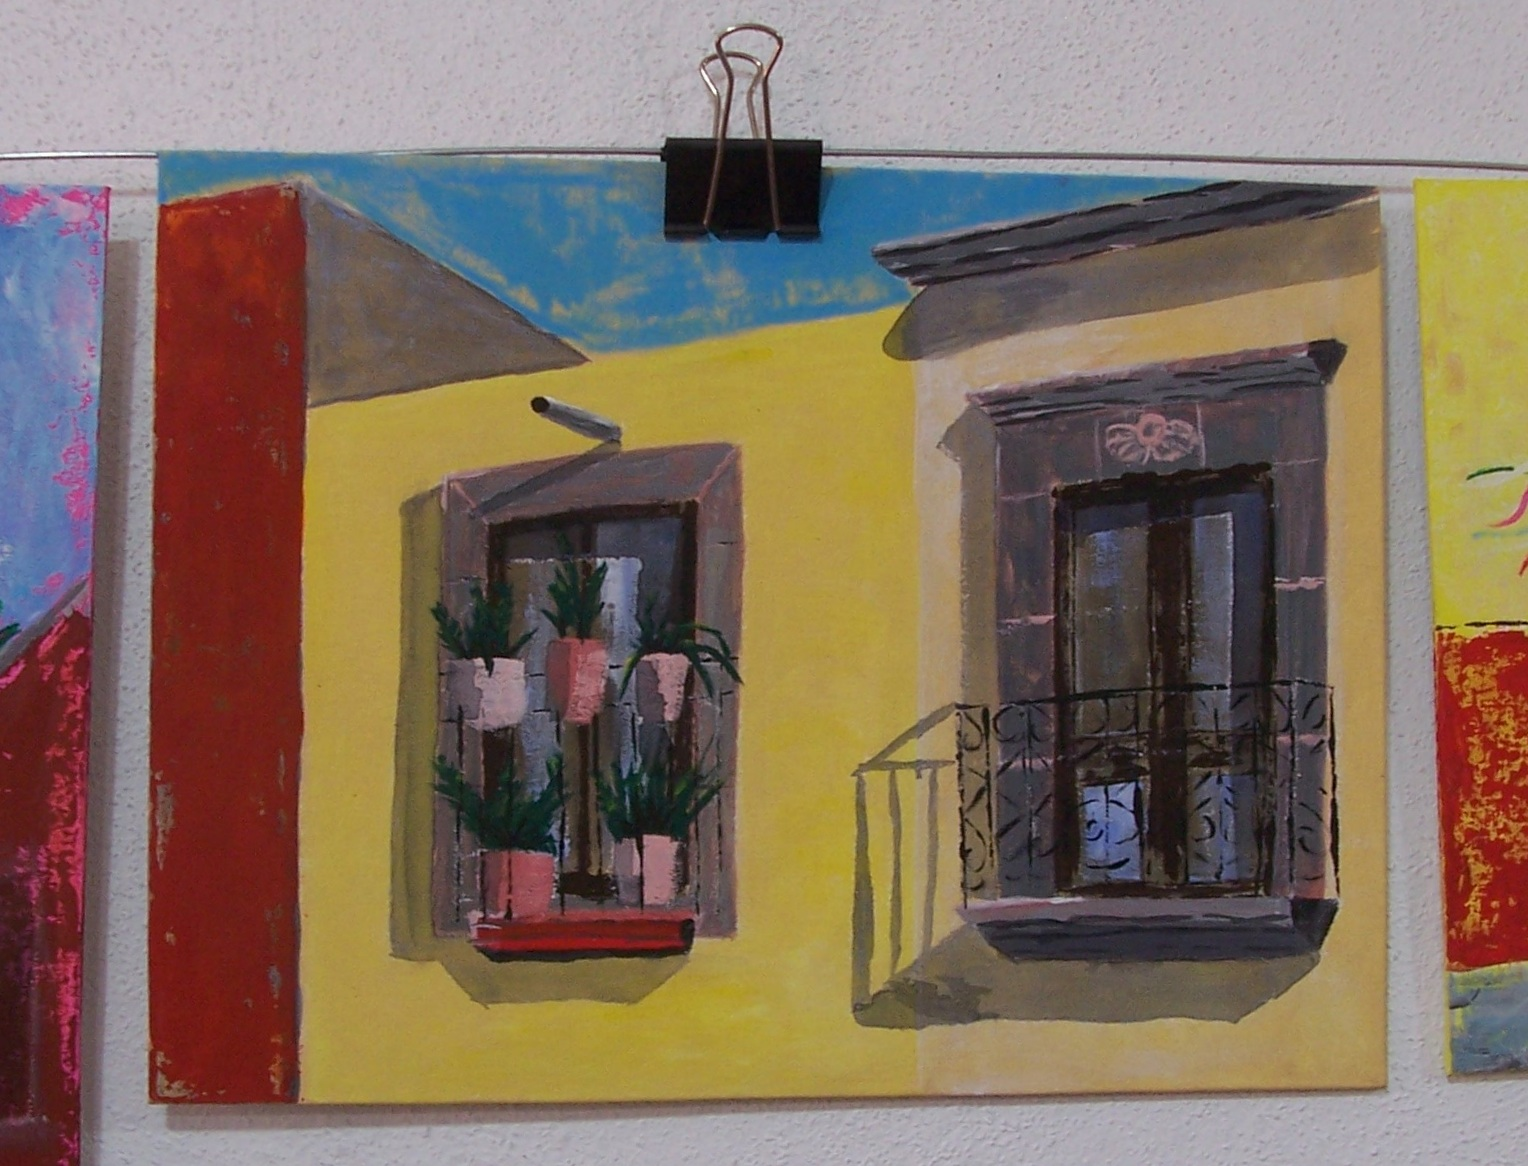 Cristi Fer Art Gallery and Workshops, San Miguel de Allende, Mexico ...